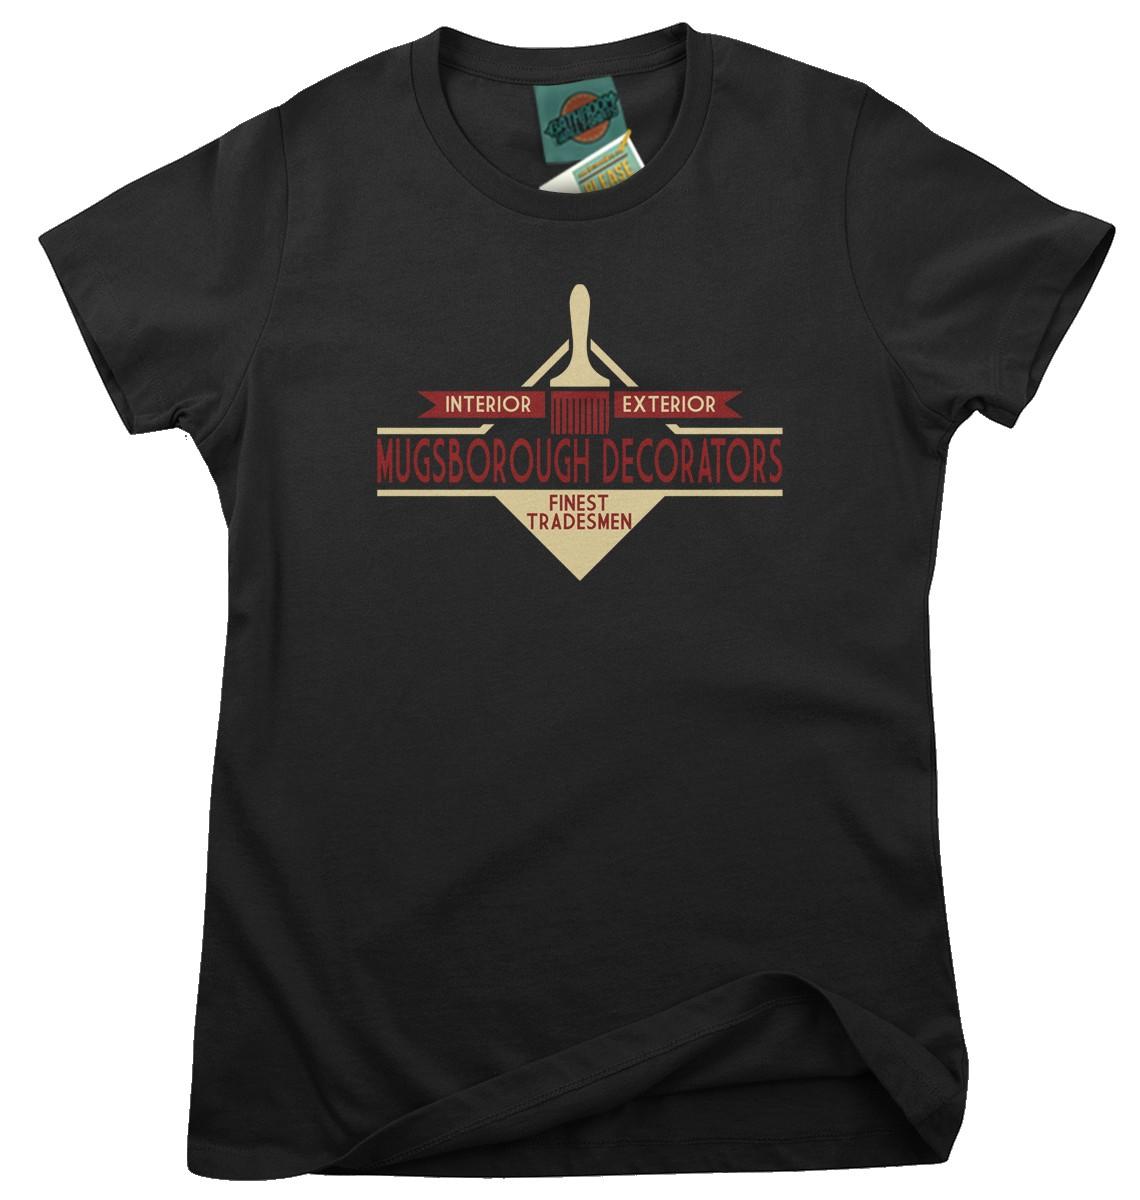 RAGGED-TROUSERED-PHILANTHROPISTS-INSPIRED-ROBERT-TRESSELL-Femmes-T-Shirt